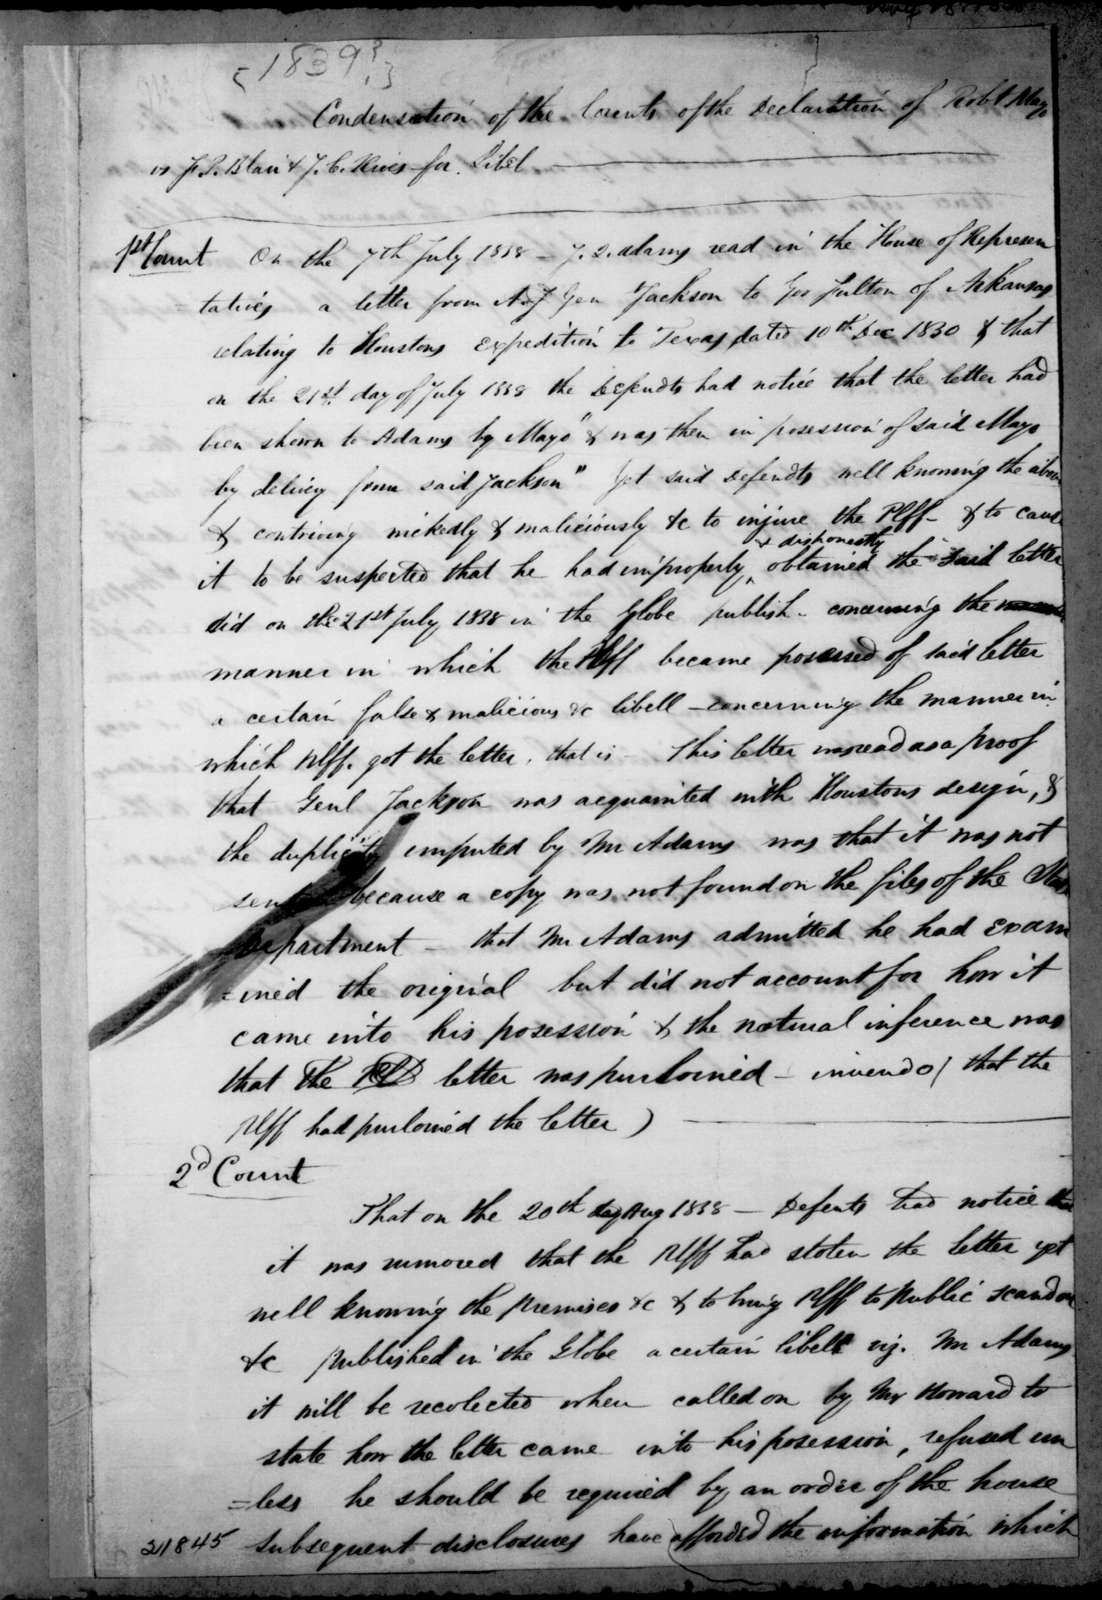 Robert Mayo to Francis Preston Blair, August 28, 1838